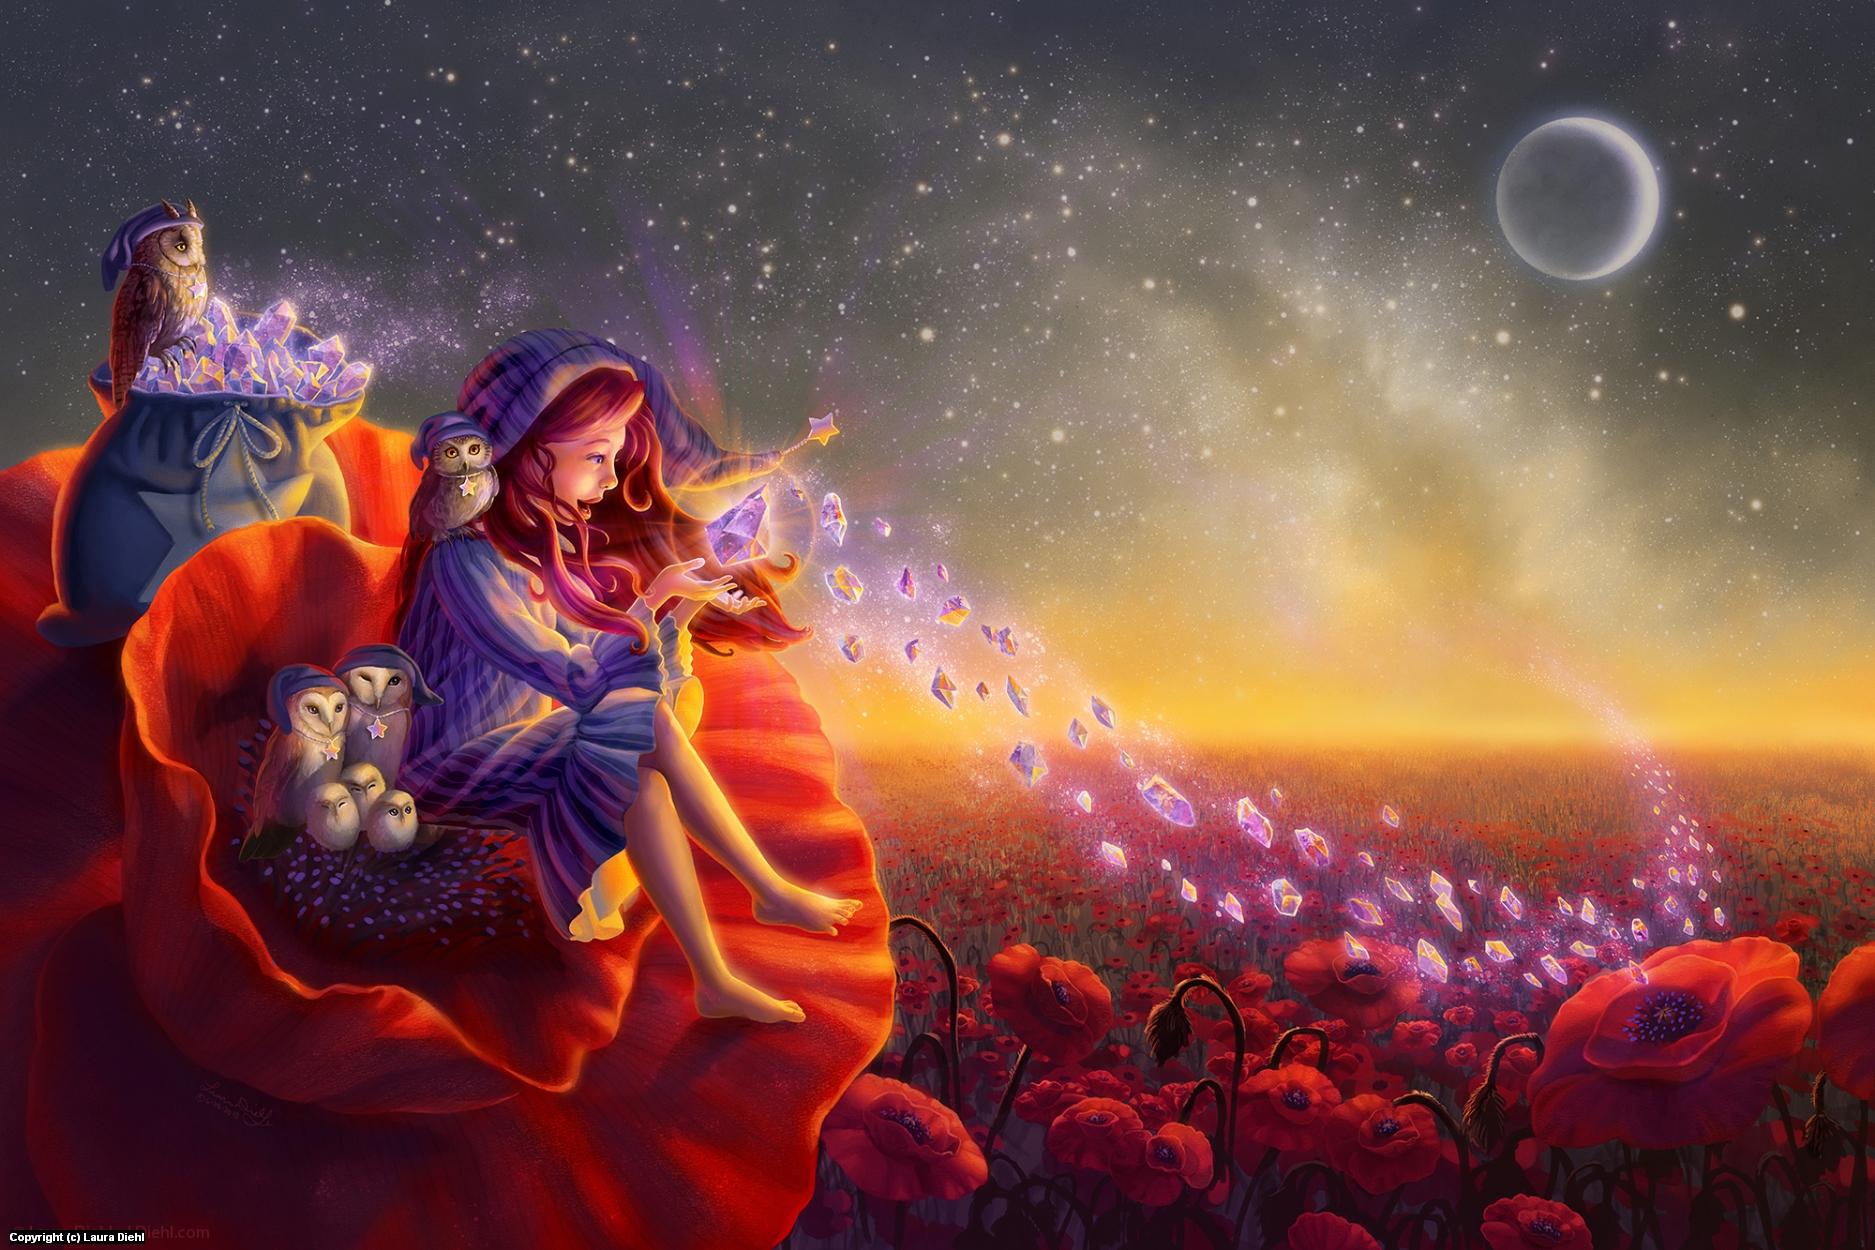 Poppy Lullaby Artwork by Laura Diehl